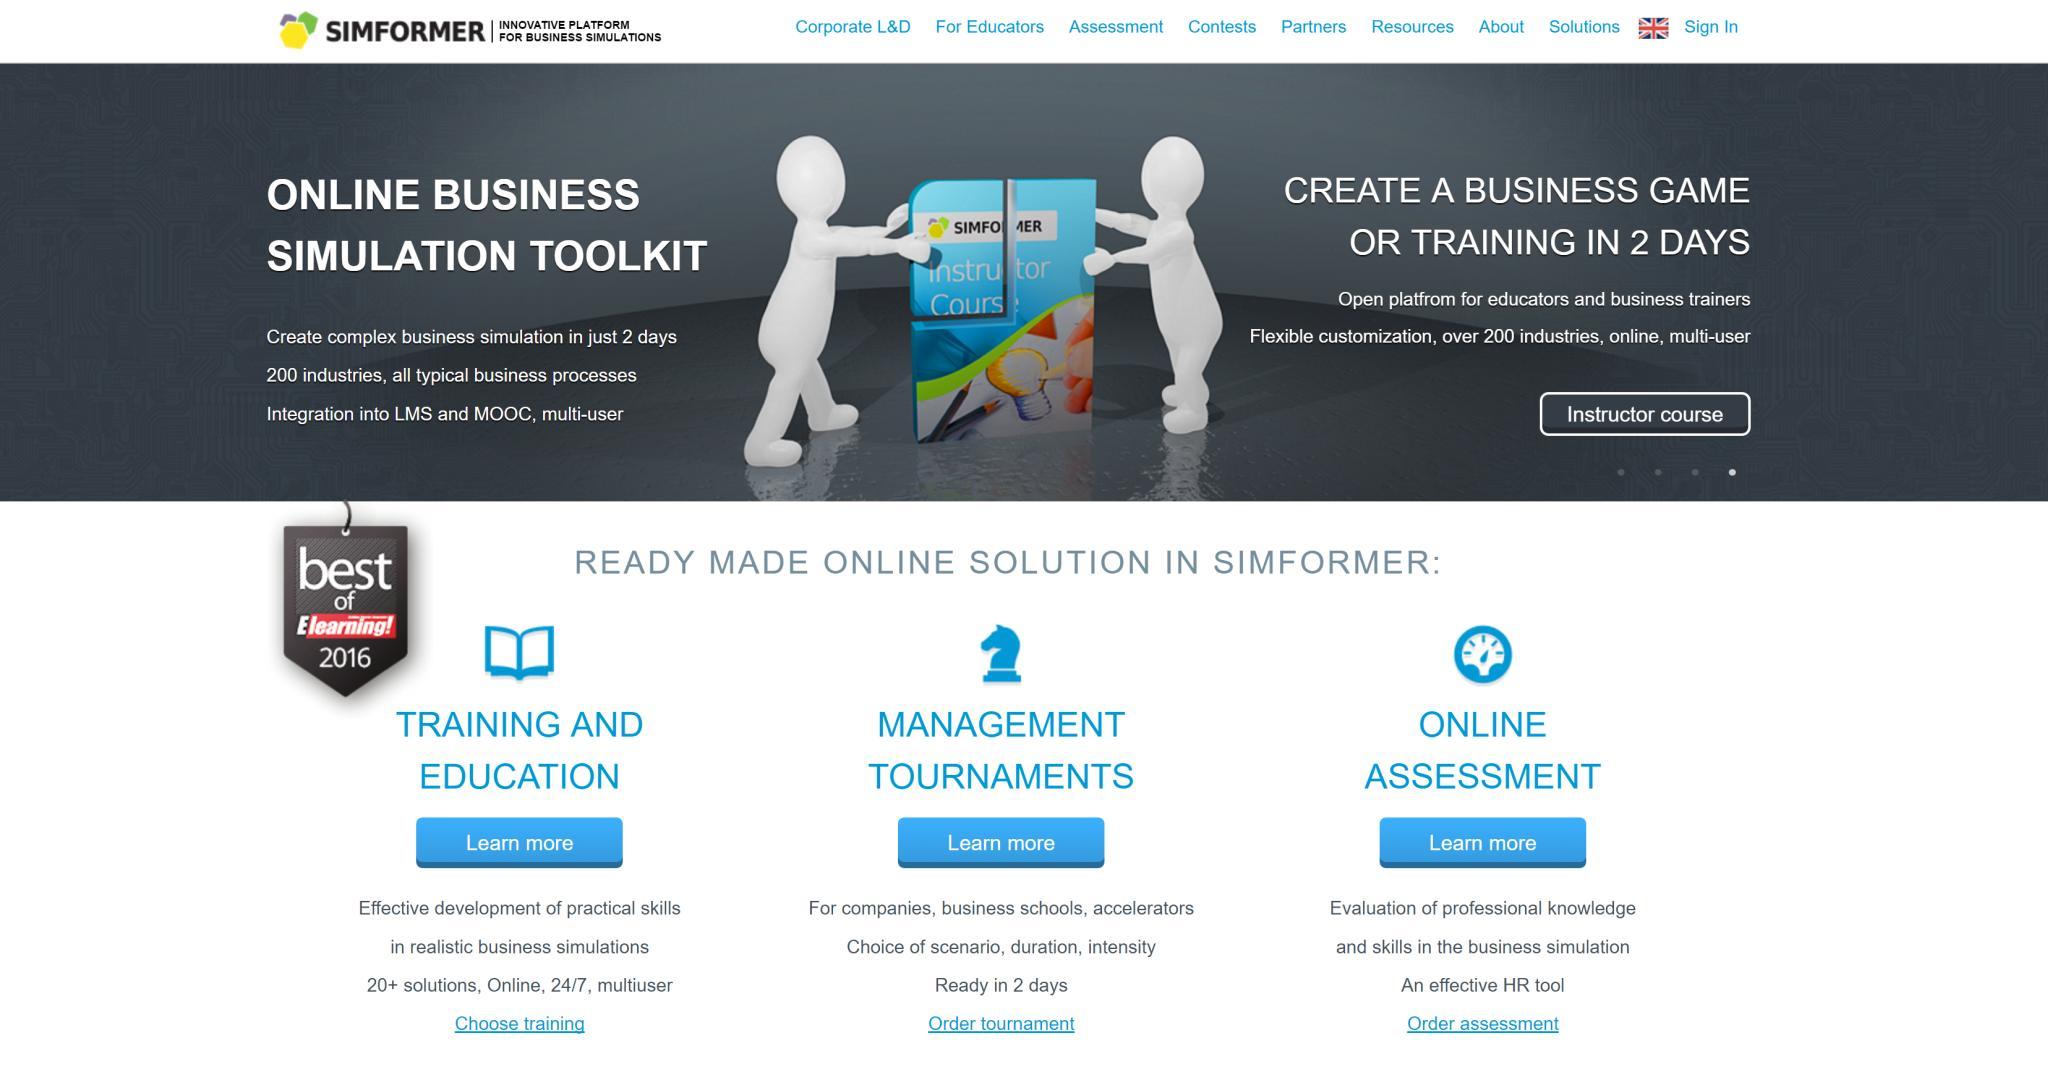 Simformer business simulations platform